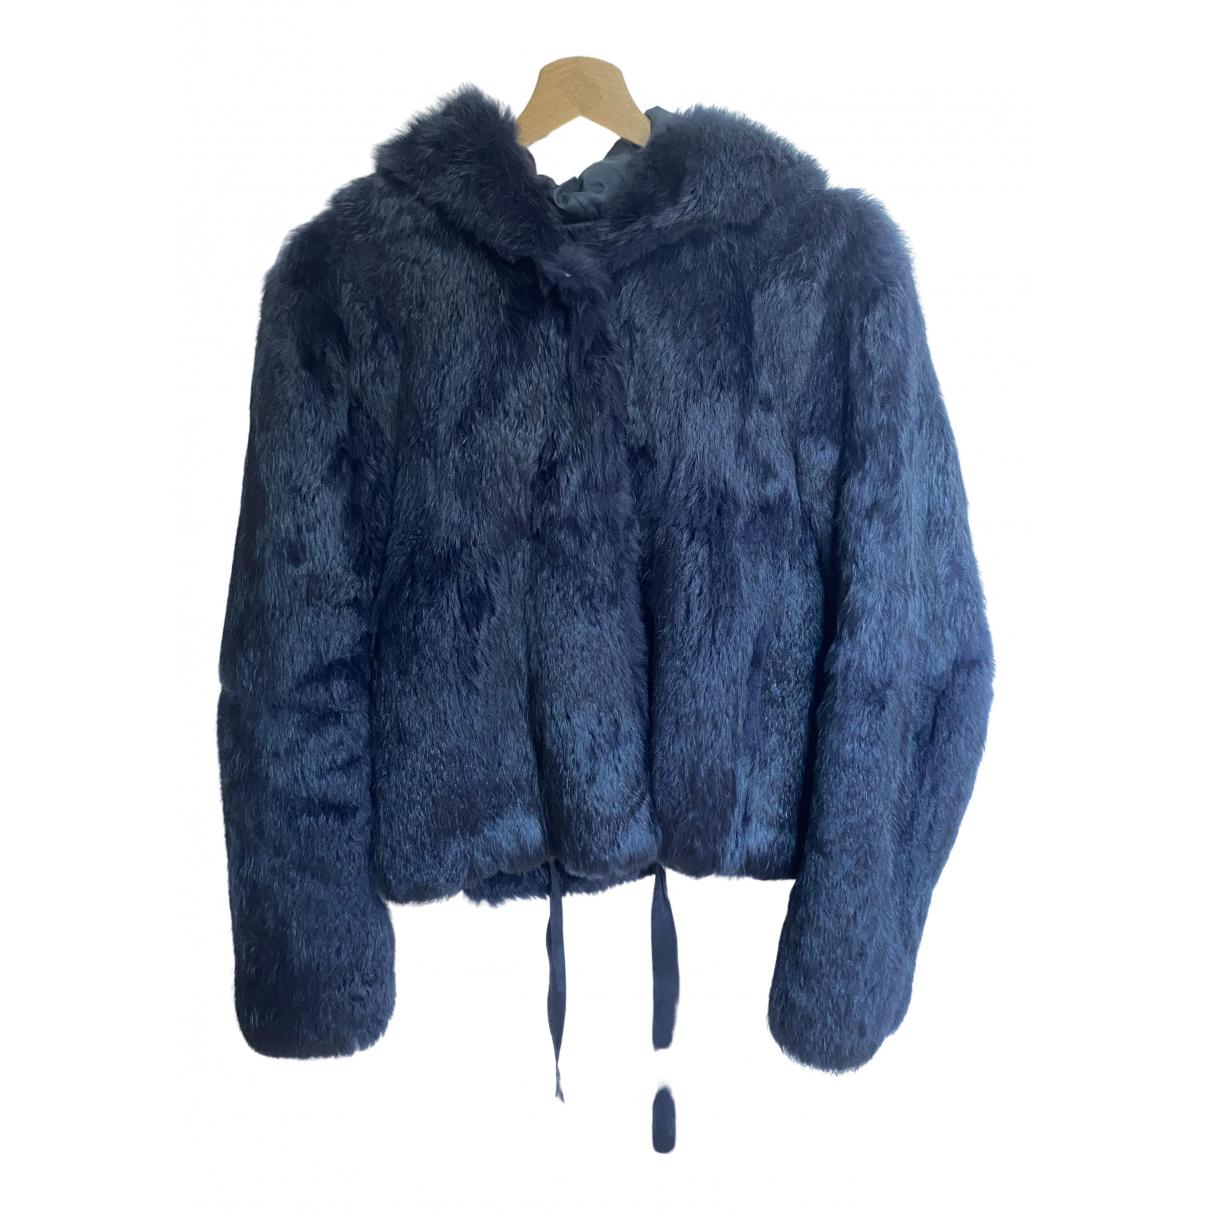 Sandro Fall Winter 2019 Blue Rabbit Leather jacket for Women 36 FR